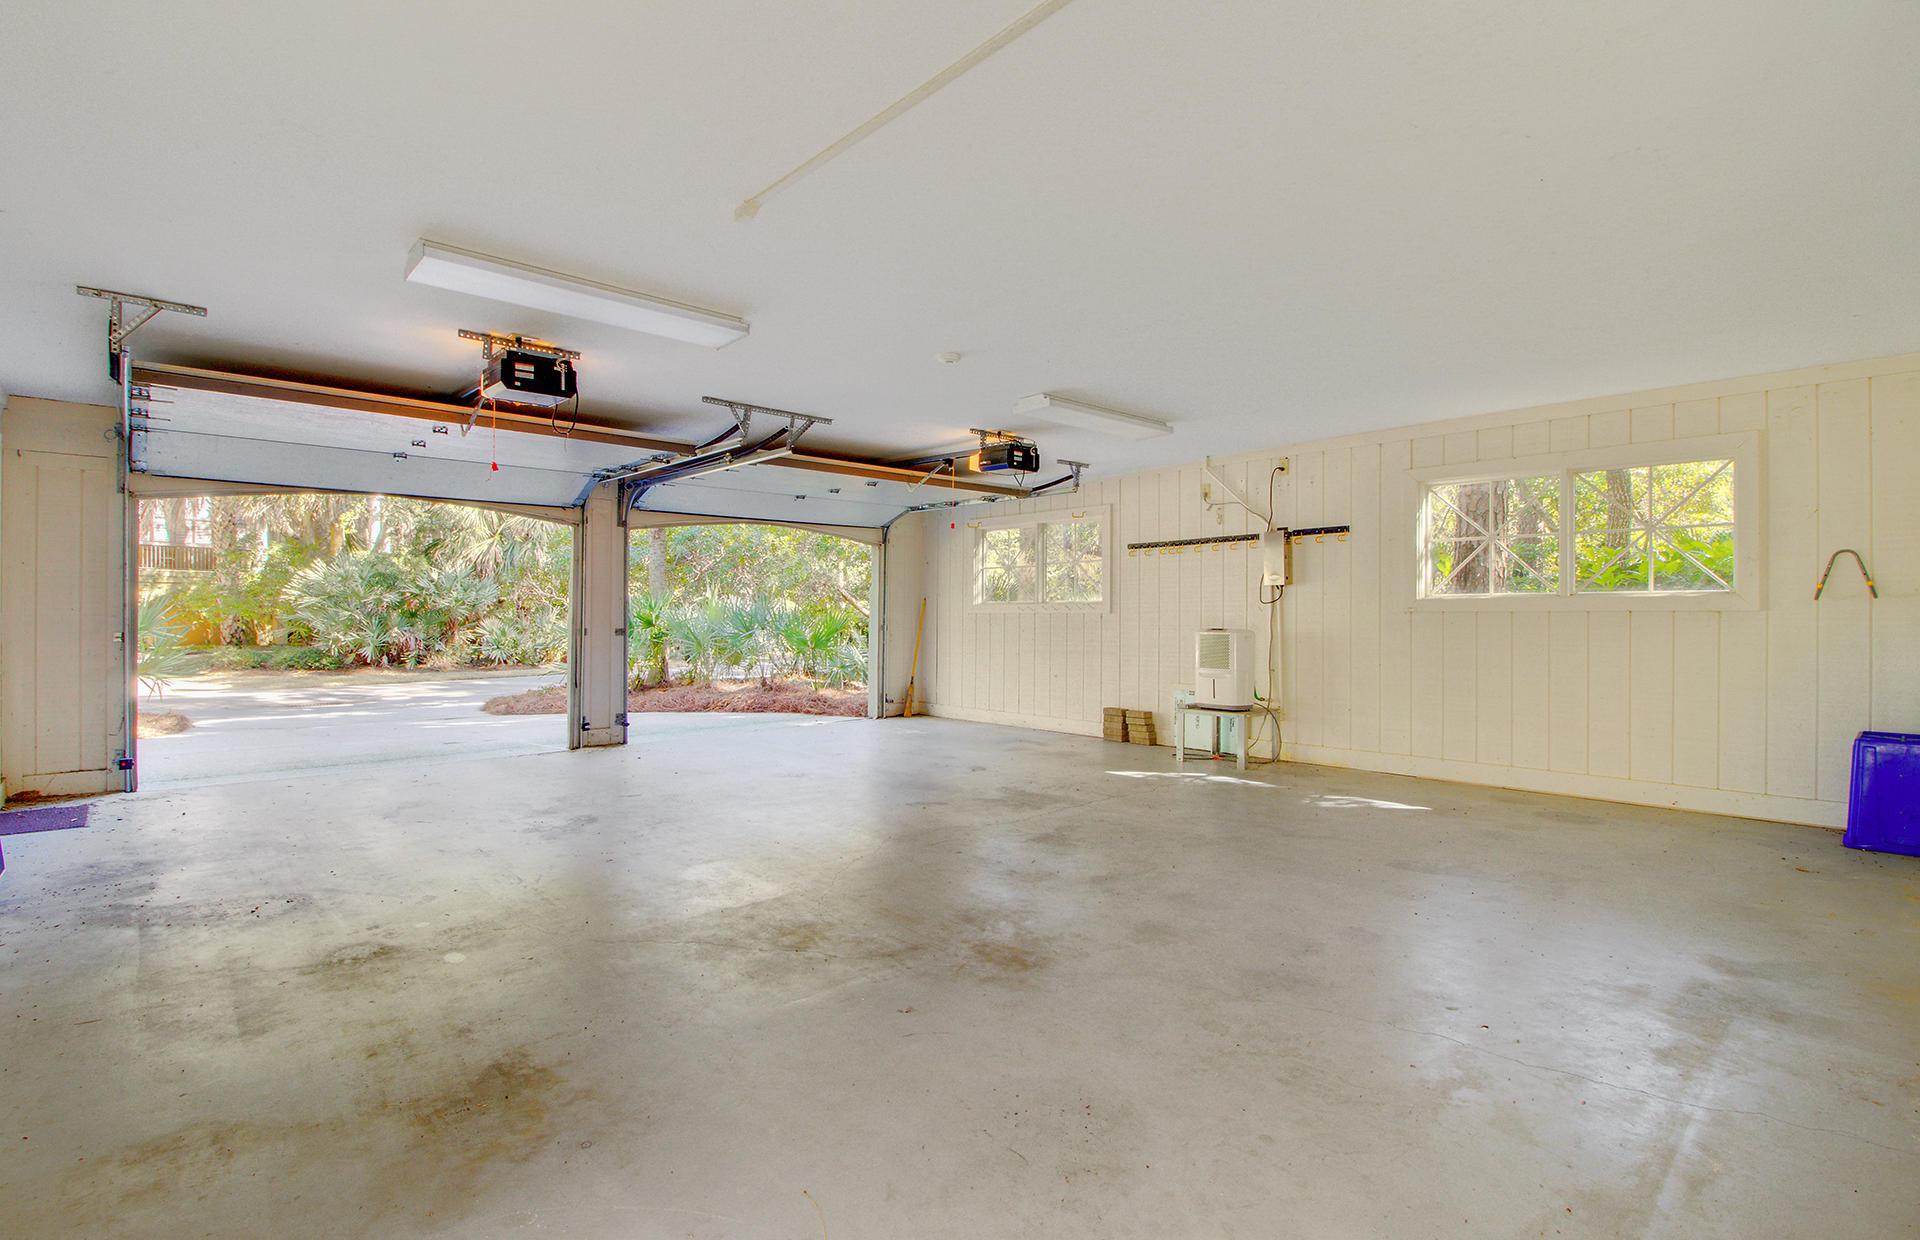 Kiawah Island Homes For Sale - 402 Ocean Oaks, Kiawah Island, SC - 8